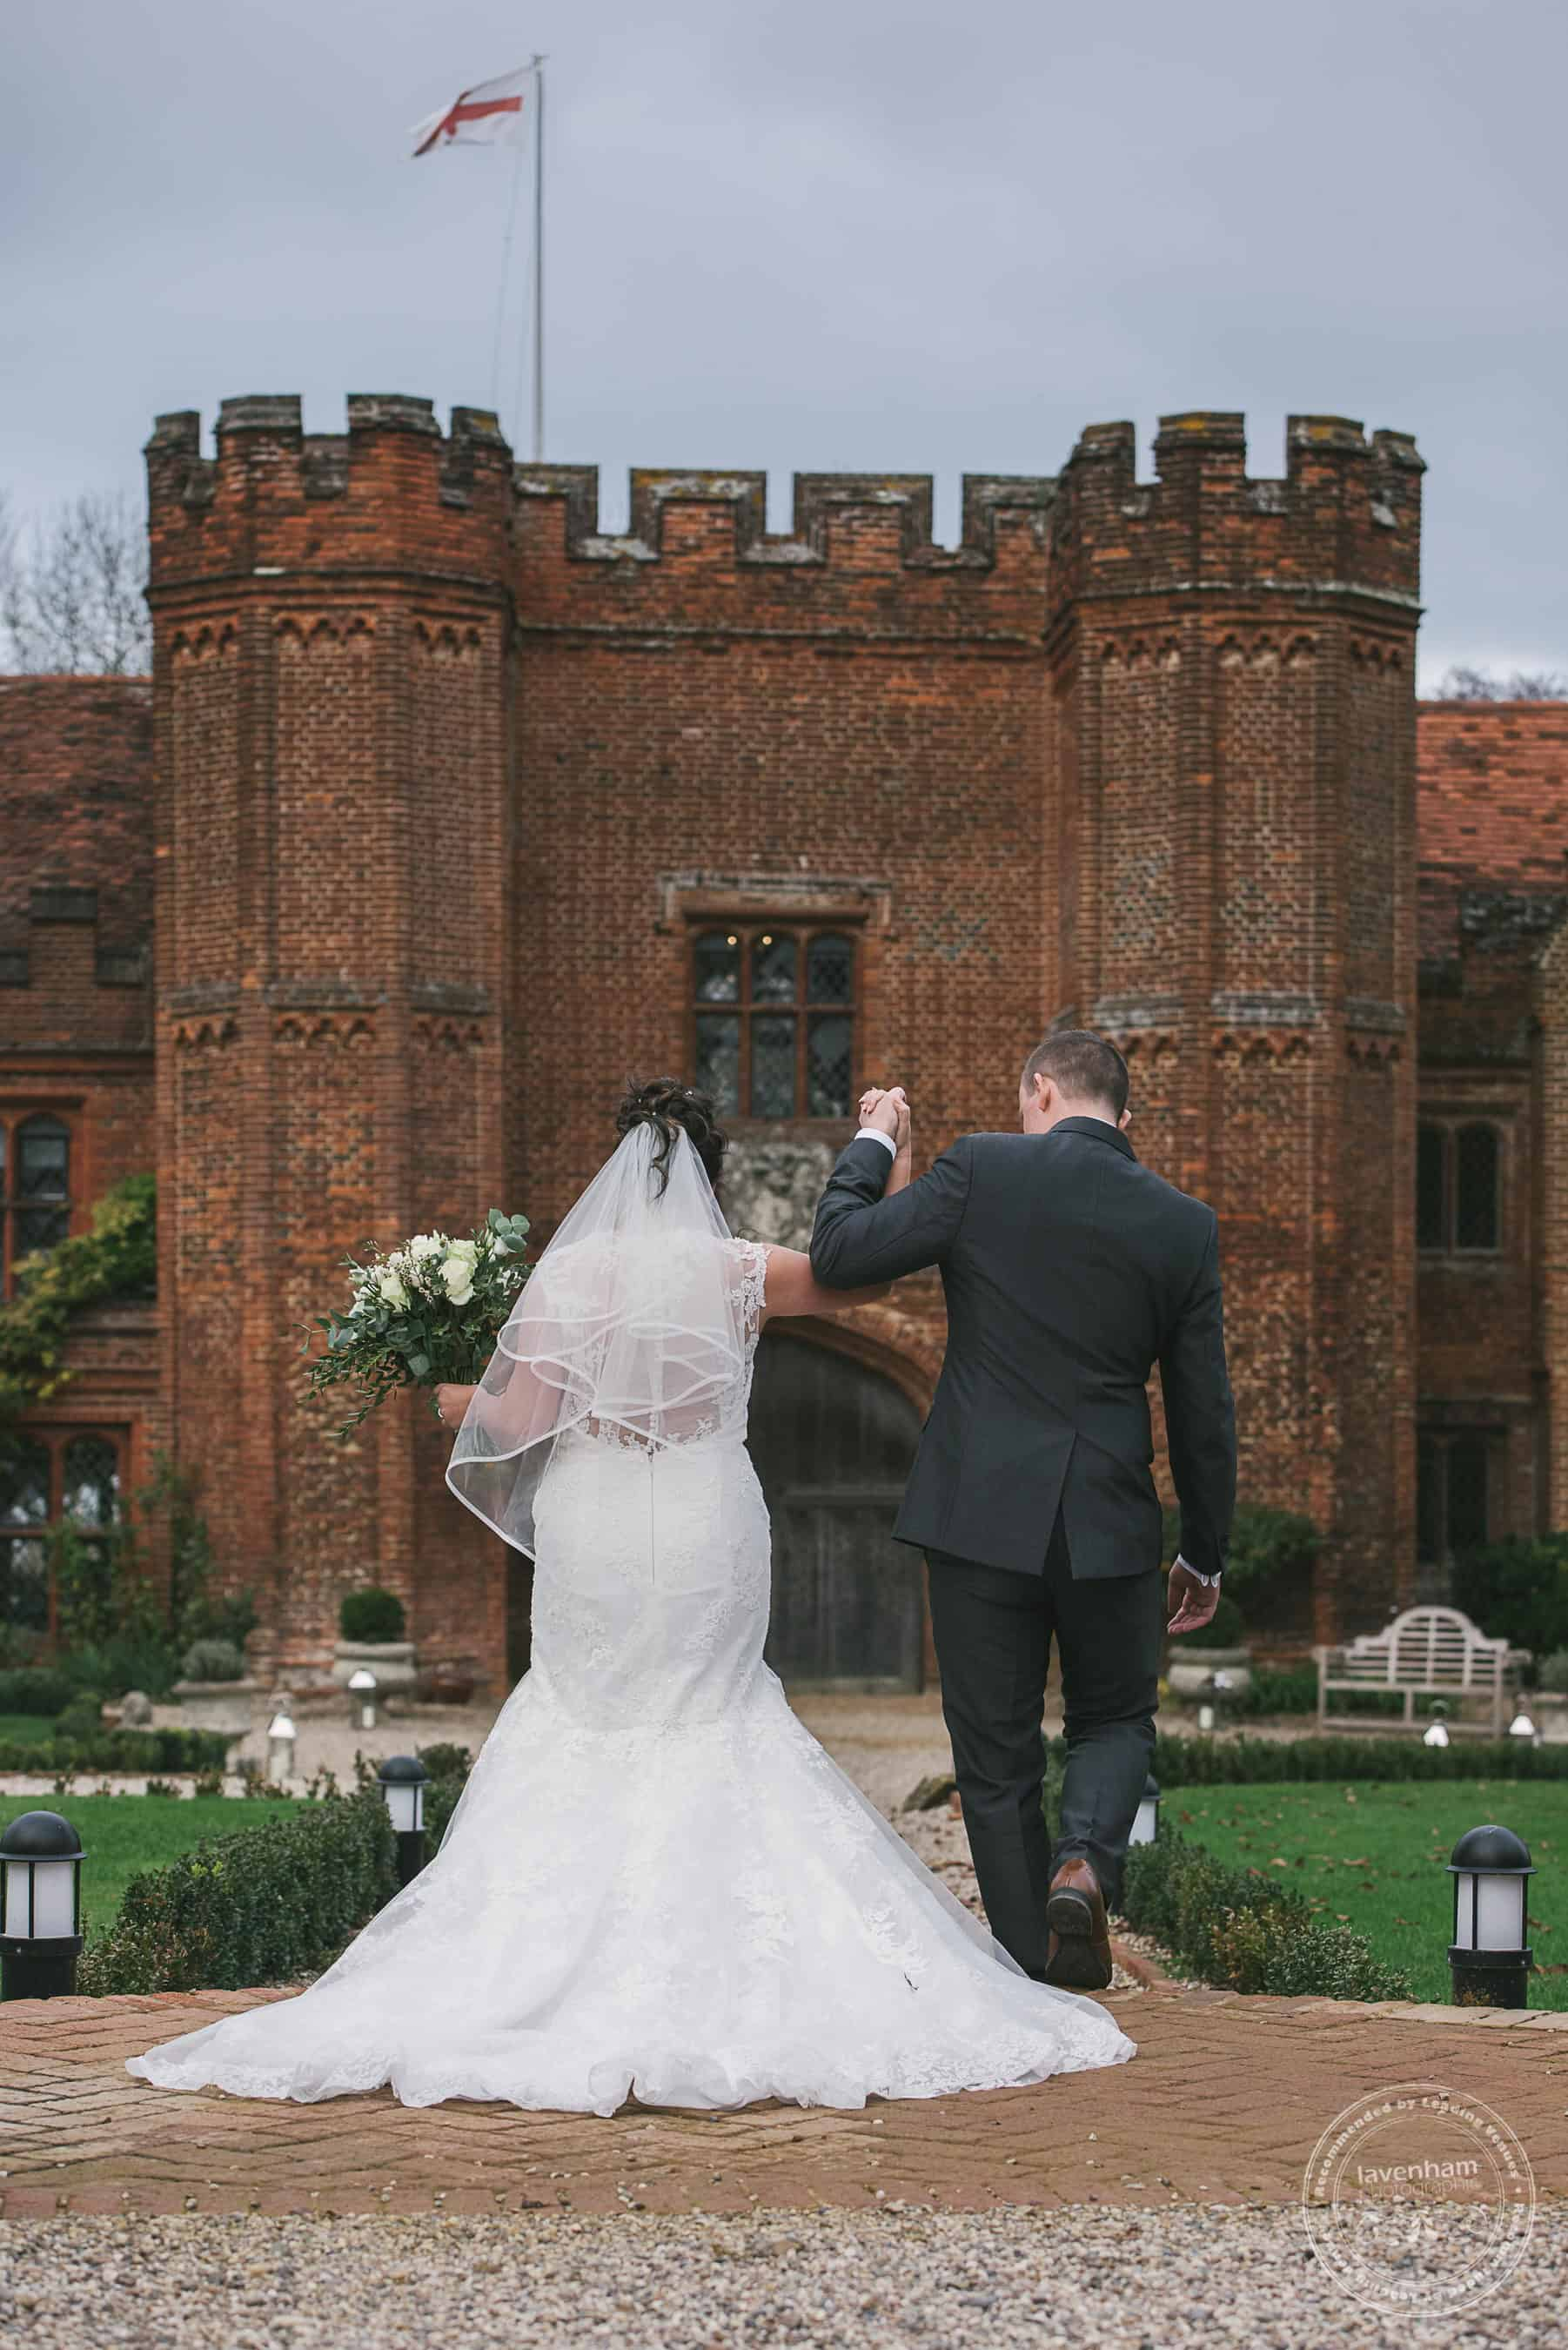 251118 Leez Priory Wedding Photography by Lavenham Photographic 056